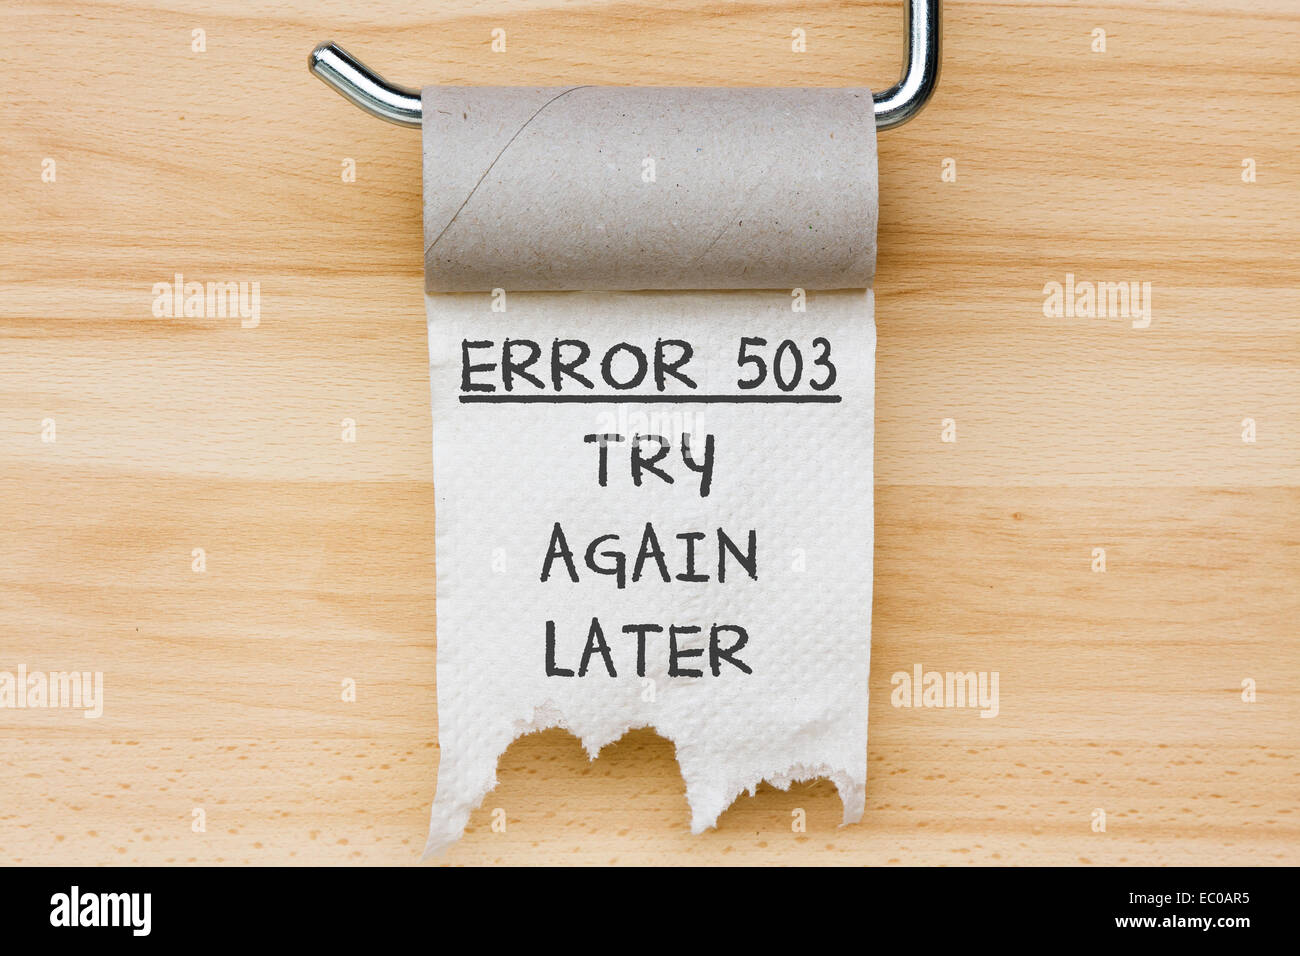 Error 503 - toilet paper as web message - Stock Image